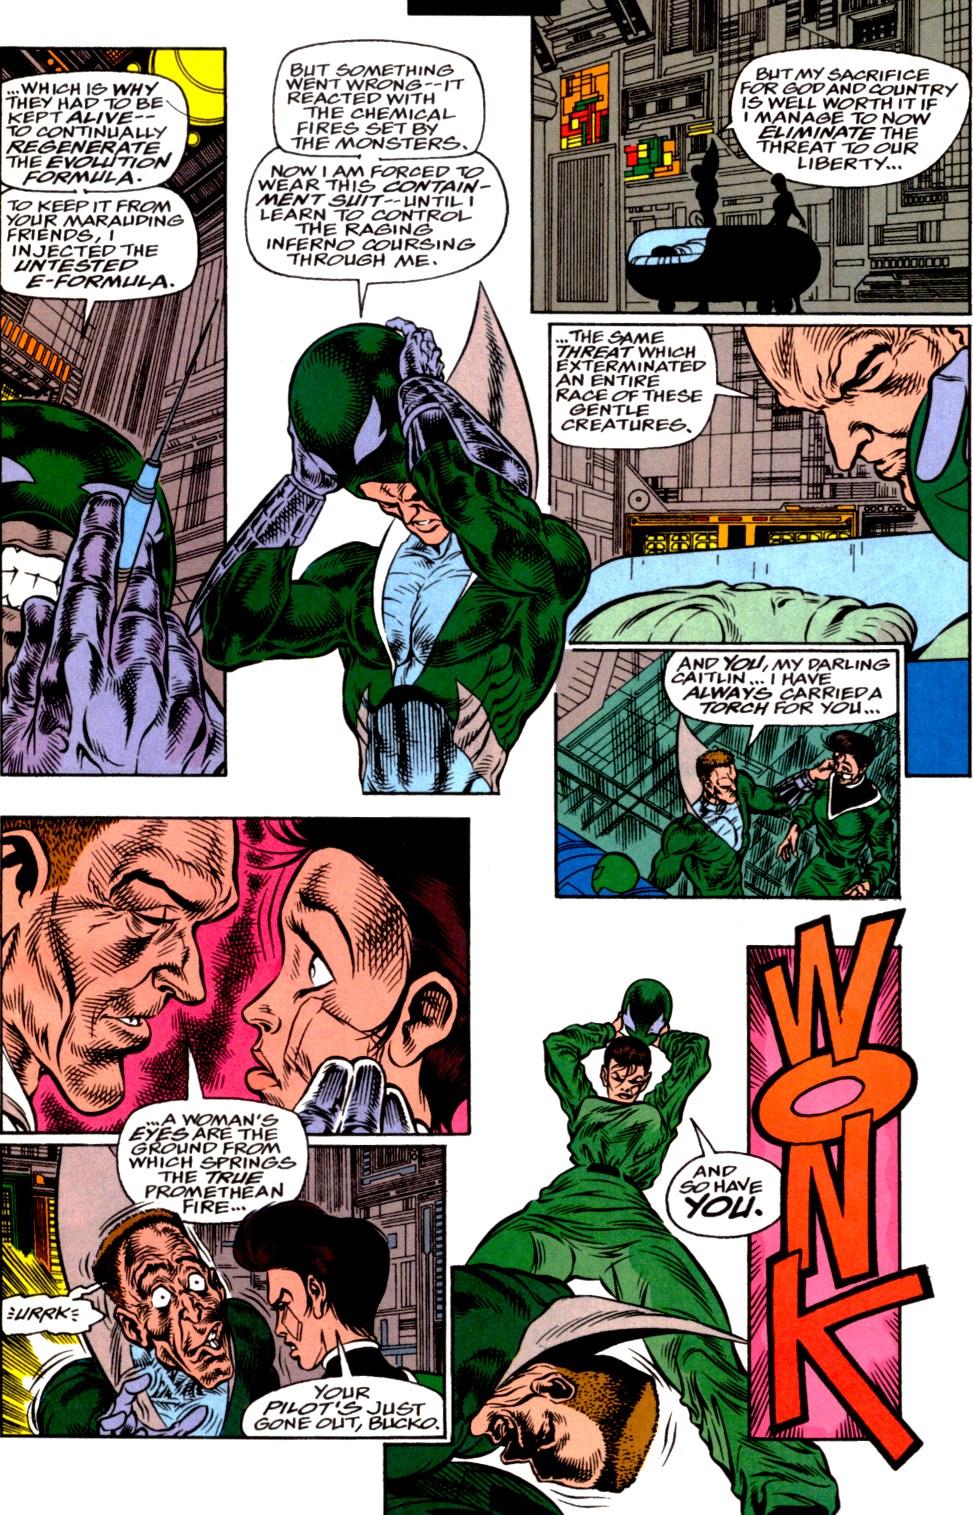 Read online Blackwulf comic -  Issue #4 - 4